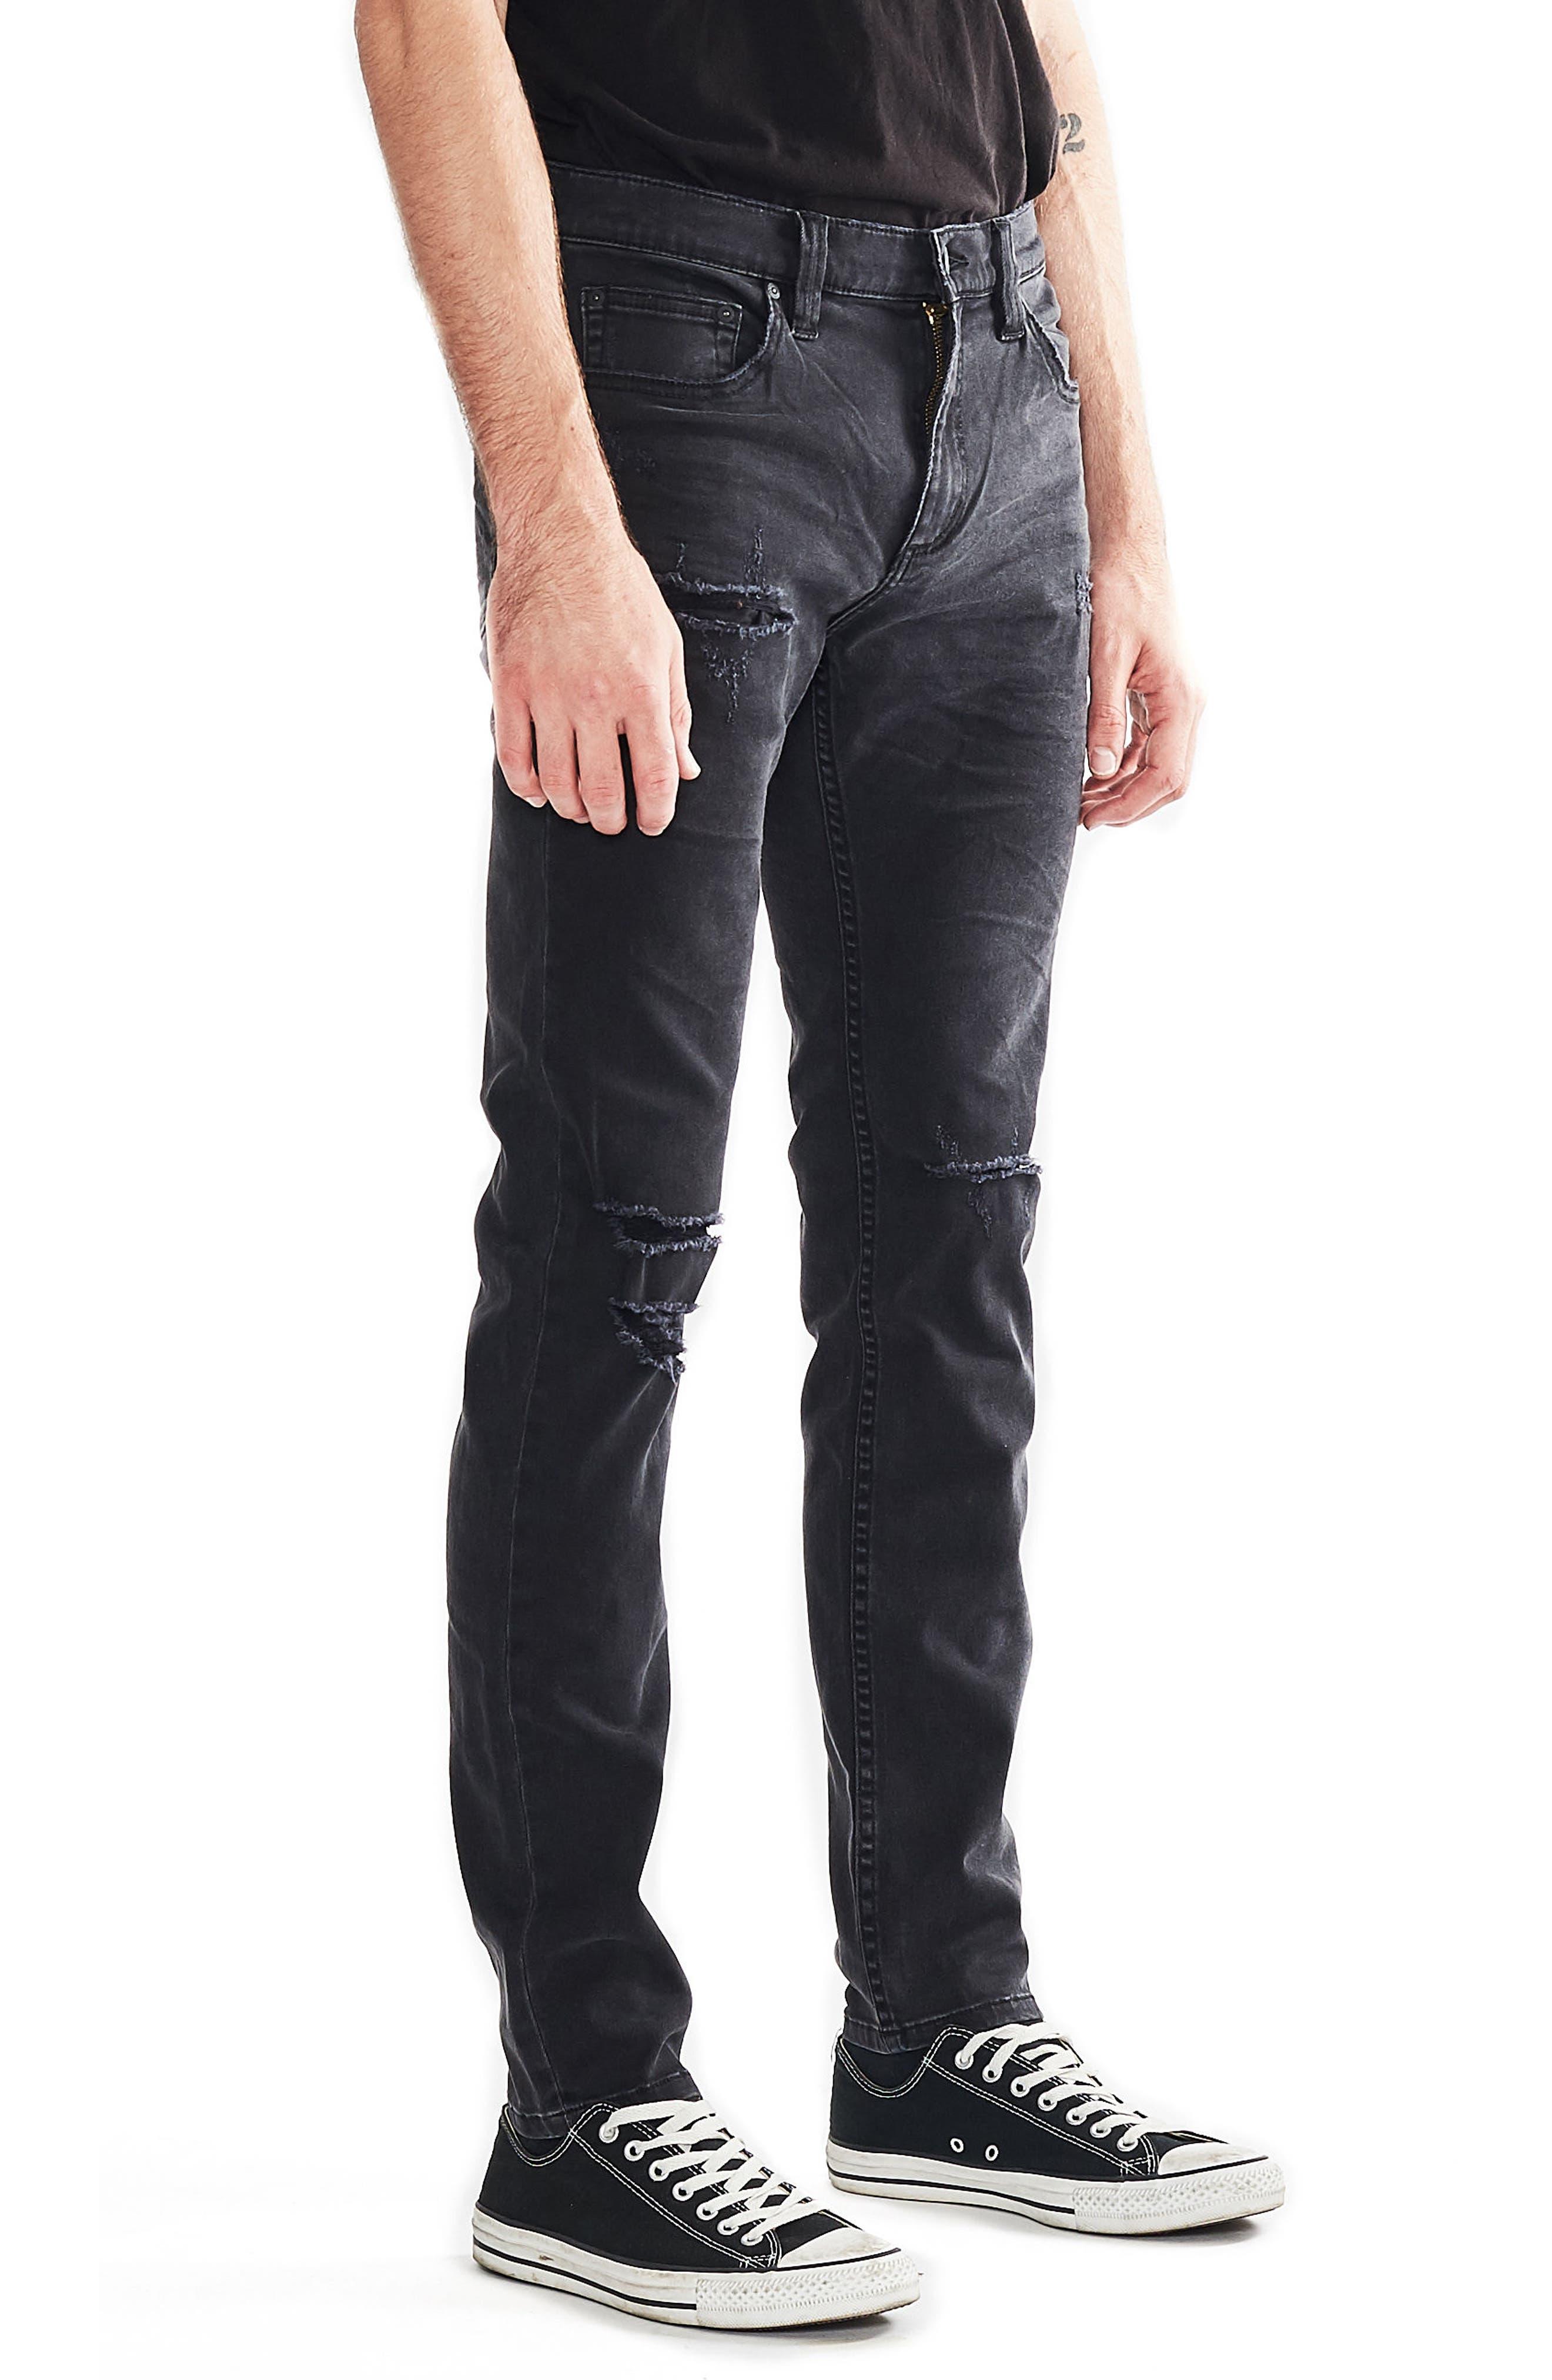 Stinger Skinny Fit Jeans,                             Alternate thumbnail 3, color,                             BLOWOUT BLACK